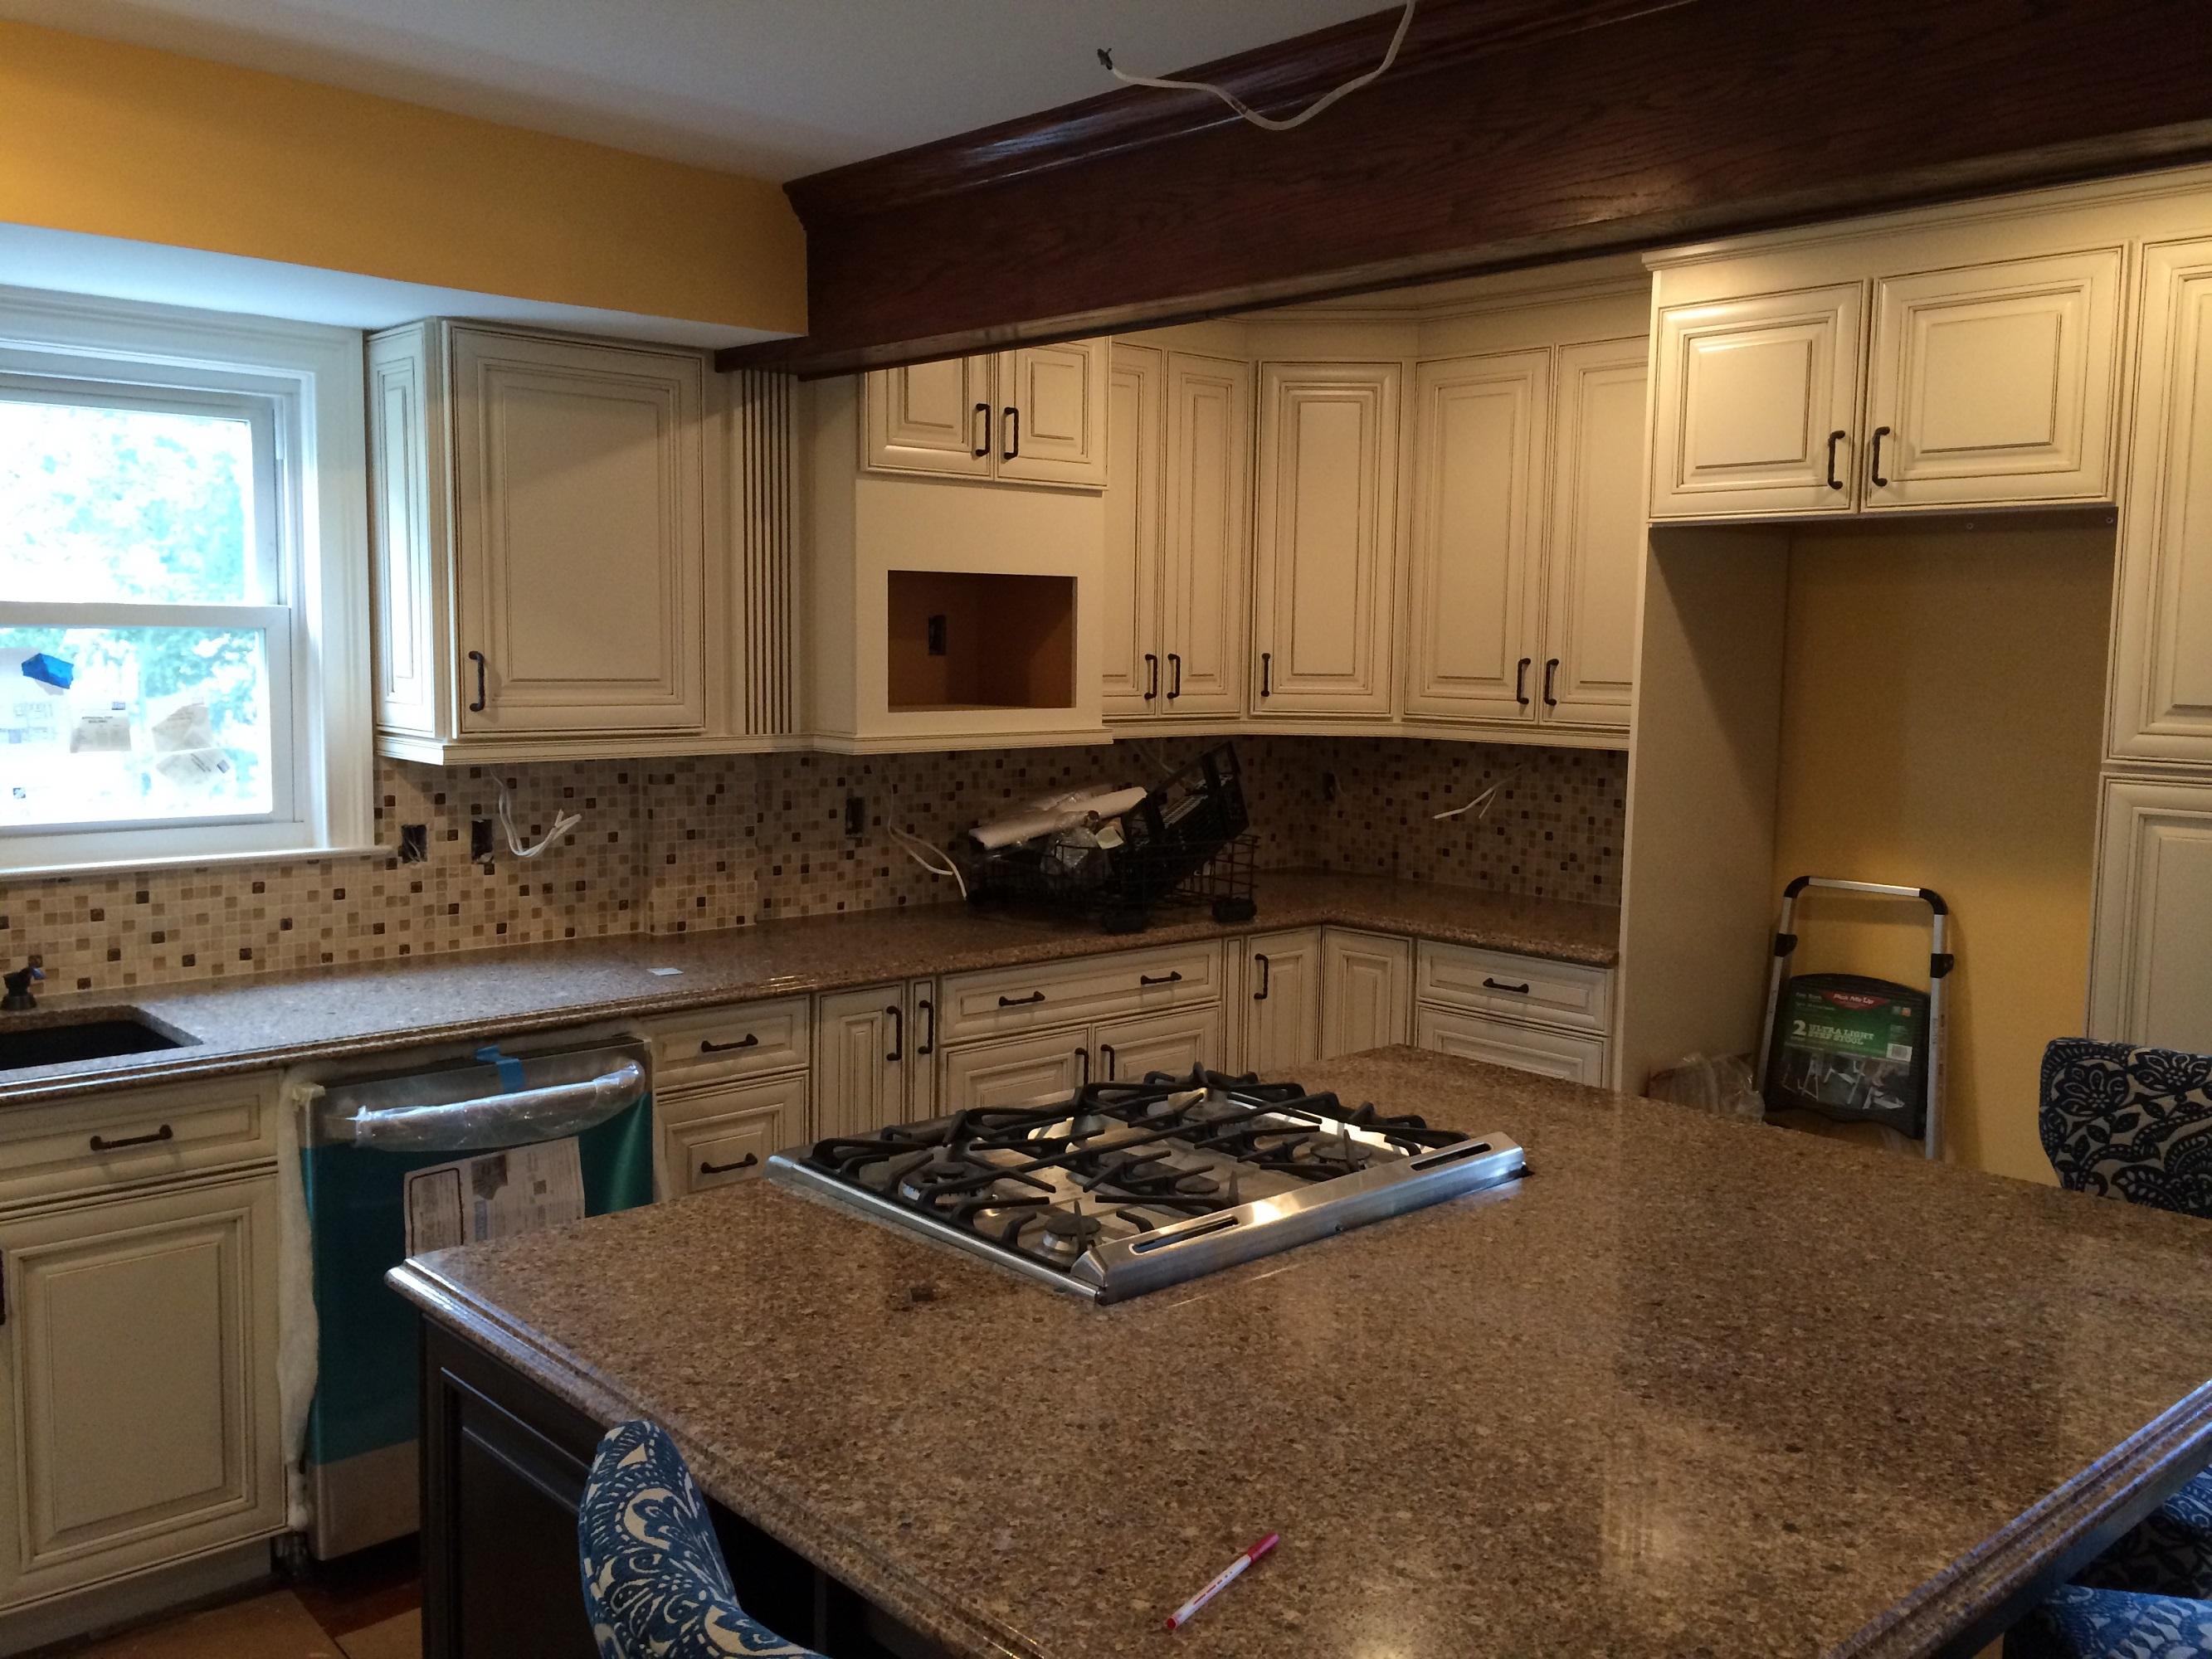 Kitchen Remodel Adventure - House -remodeling, decorating ...